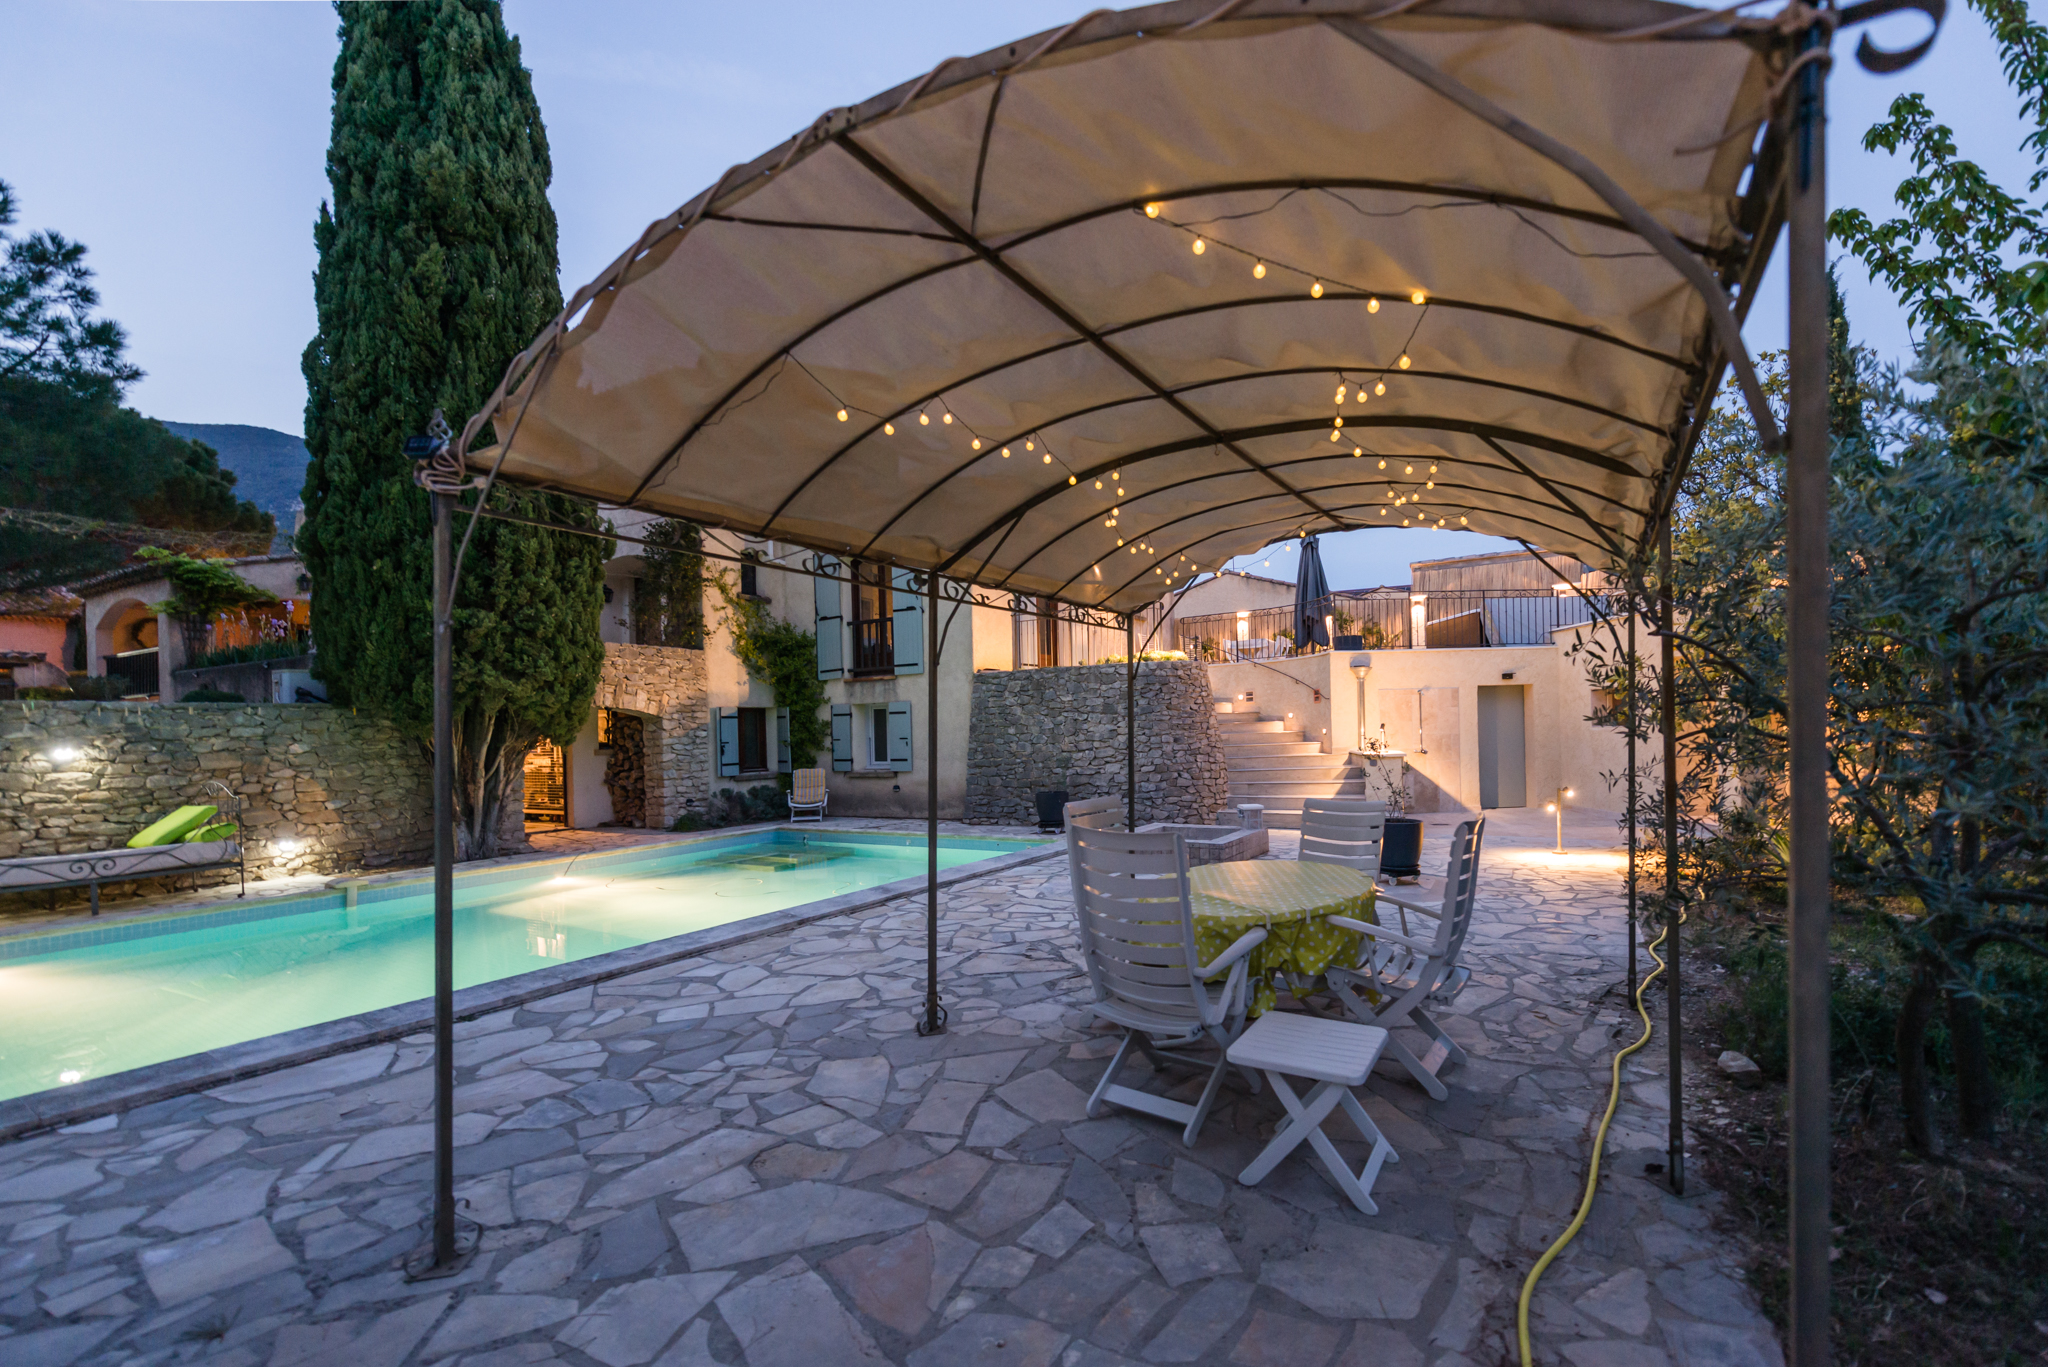 feriebolig-provence-privat-pool-DSC_4818.jpg